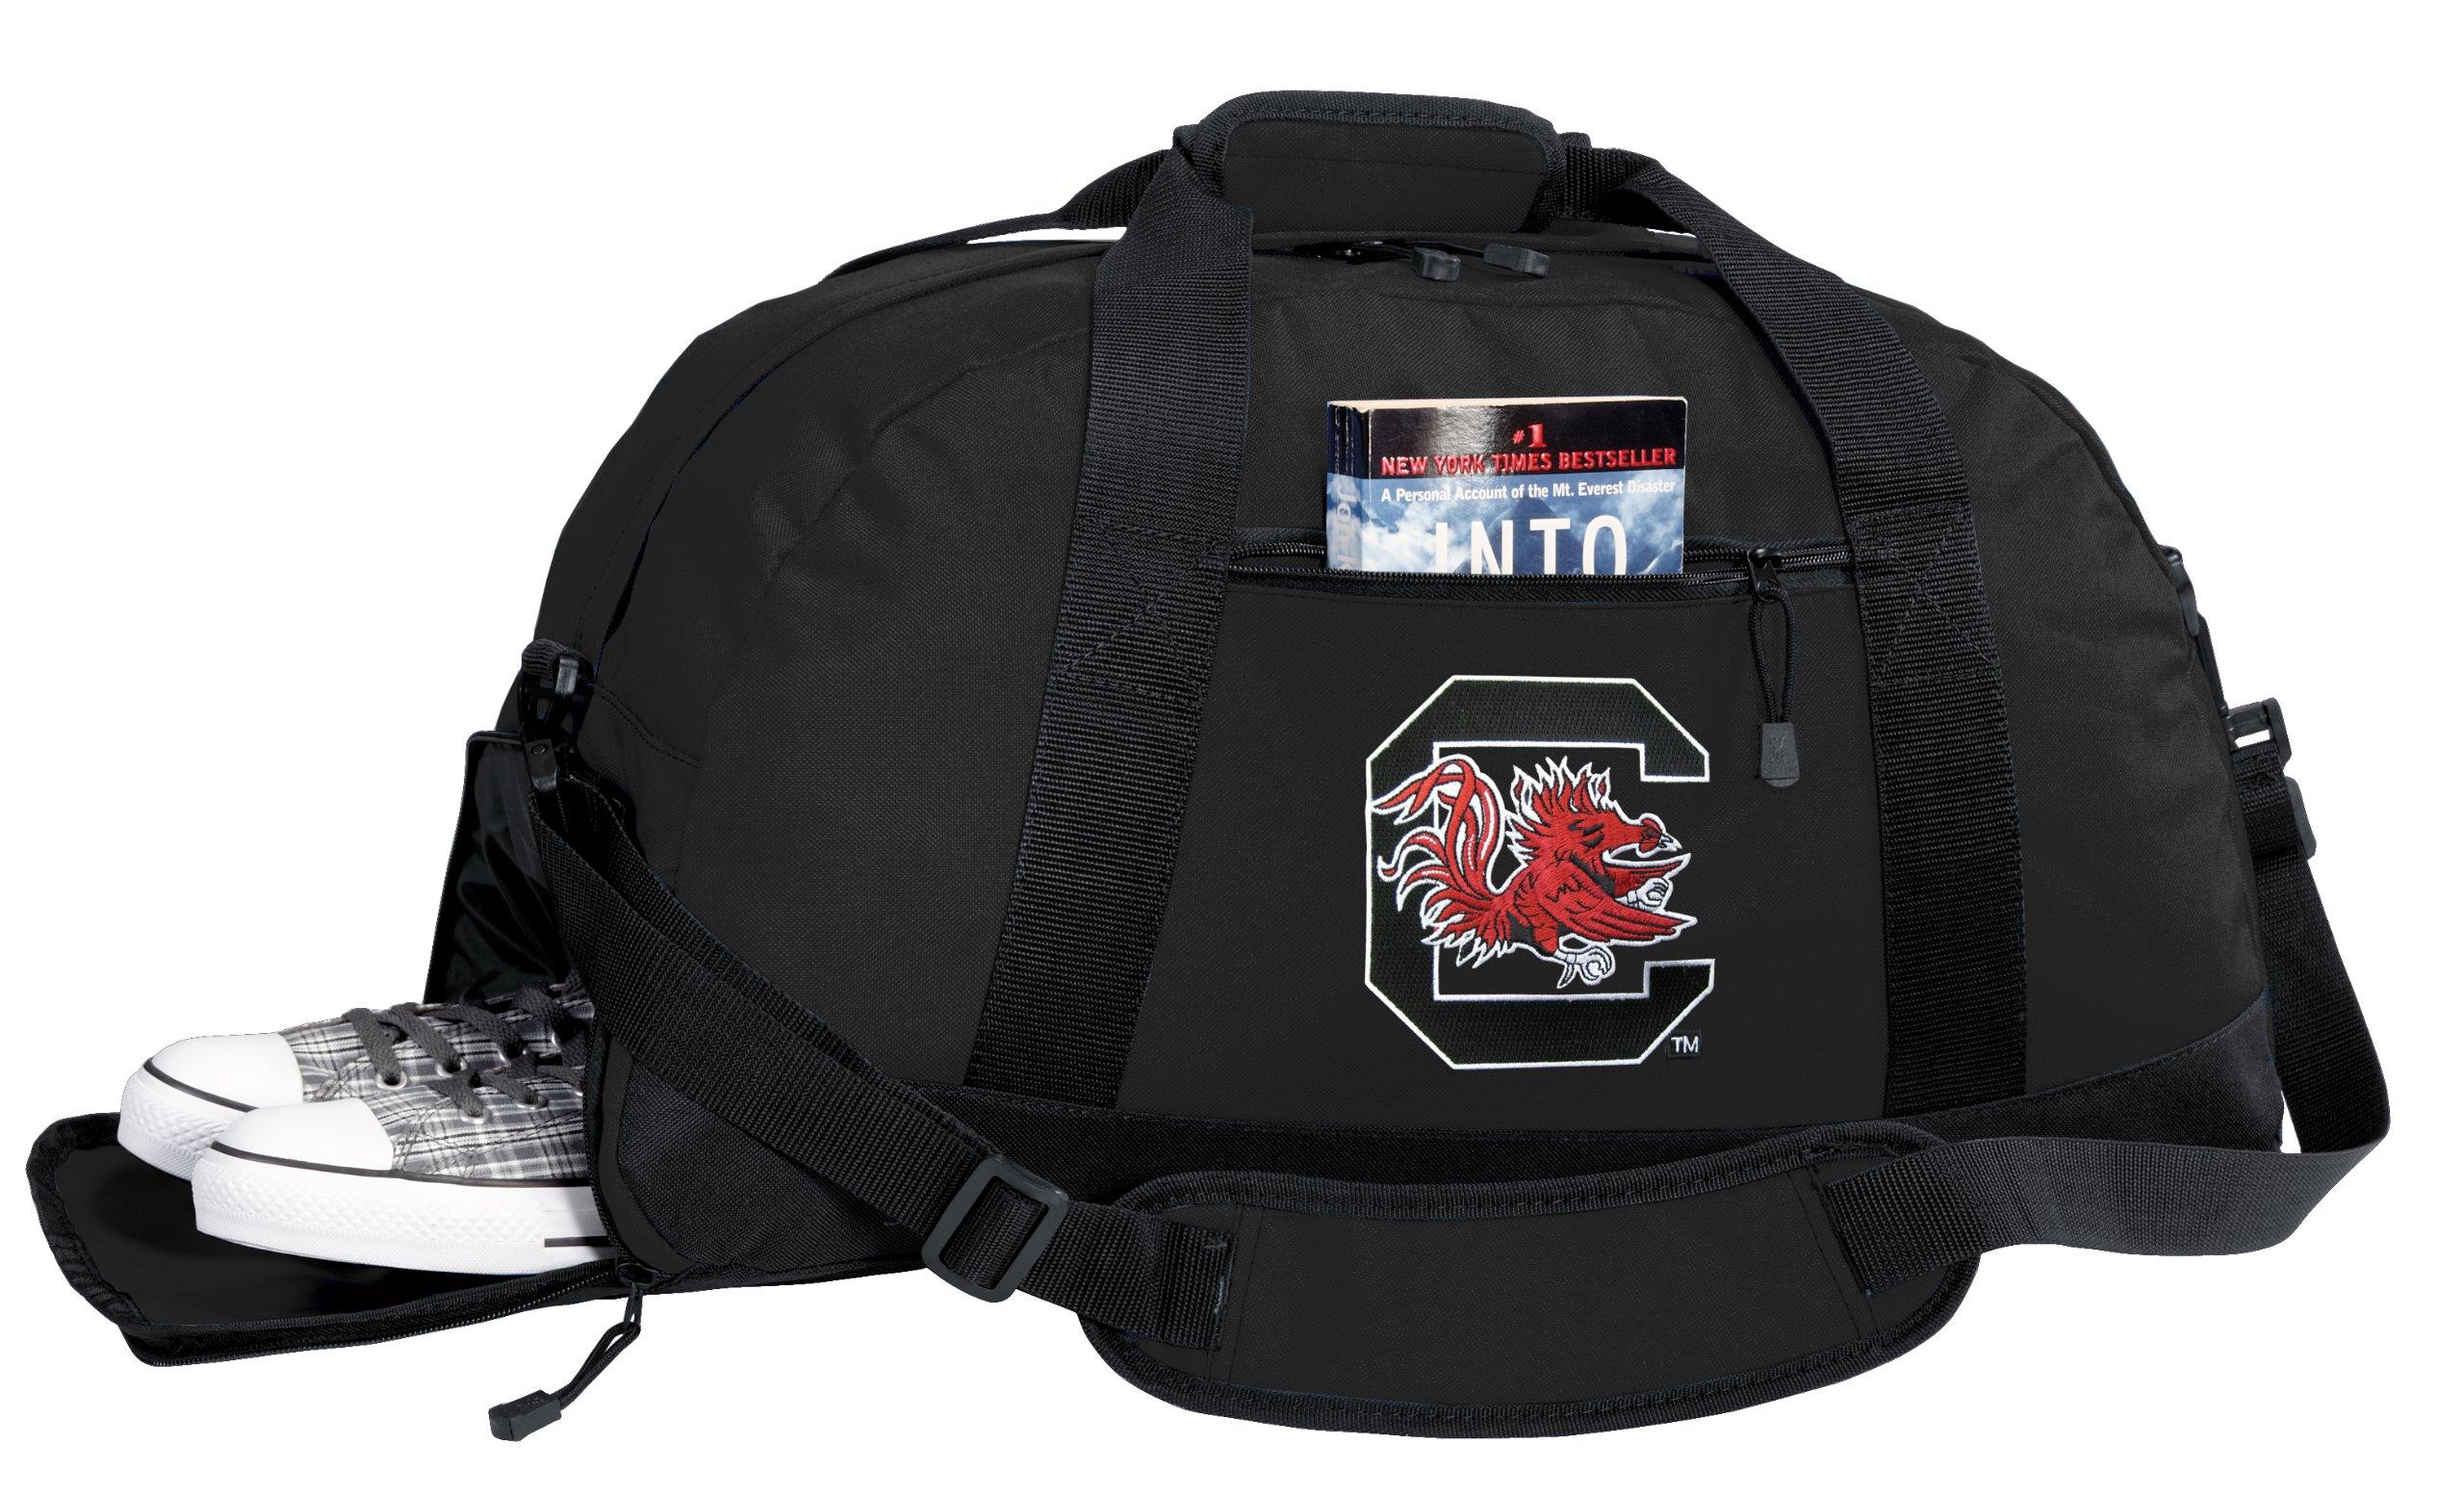 NCAA University of South Carolina Duffel Bag - South Carolina Gamecocks Gym Bags w/ SHOE POCKET